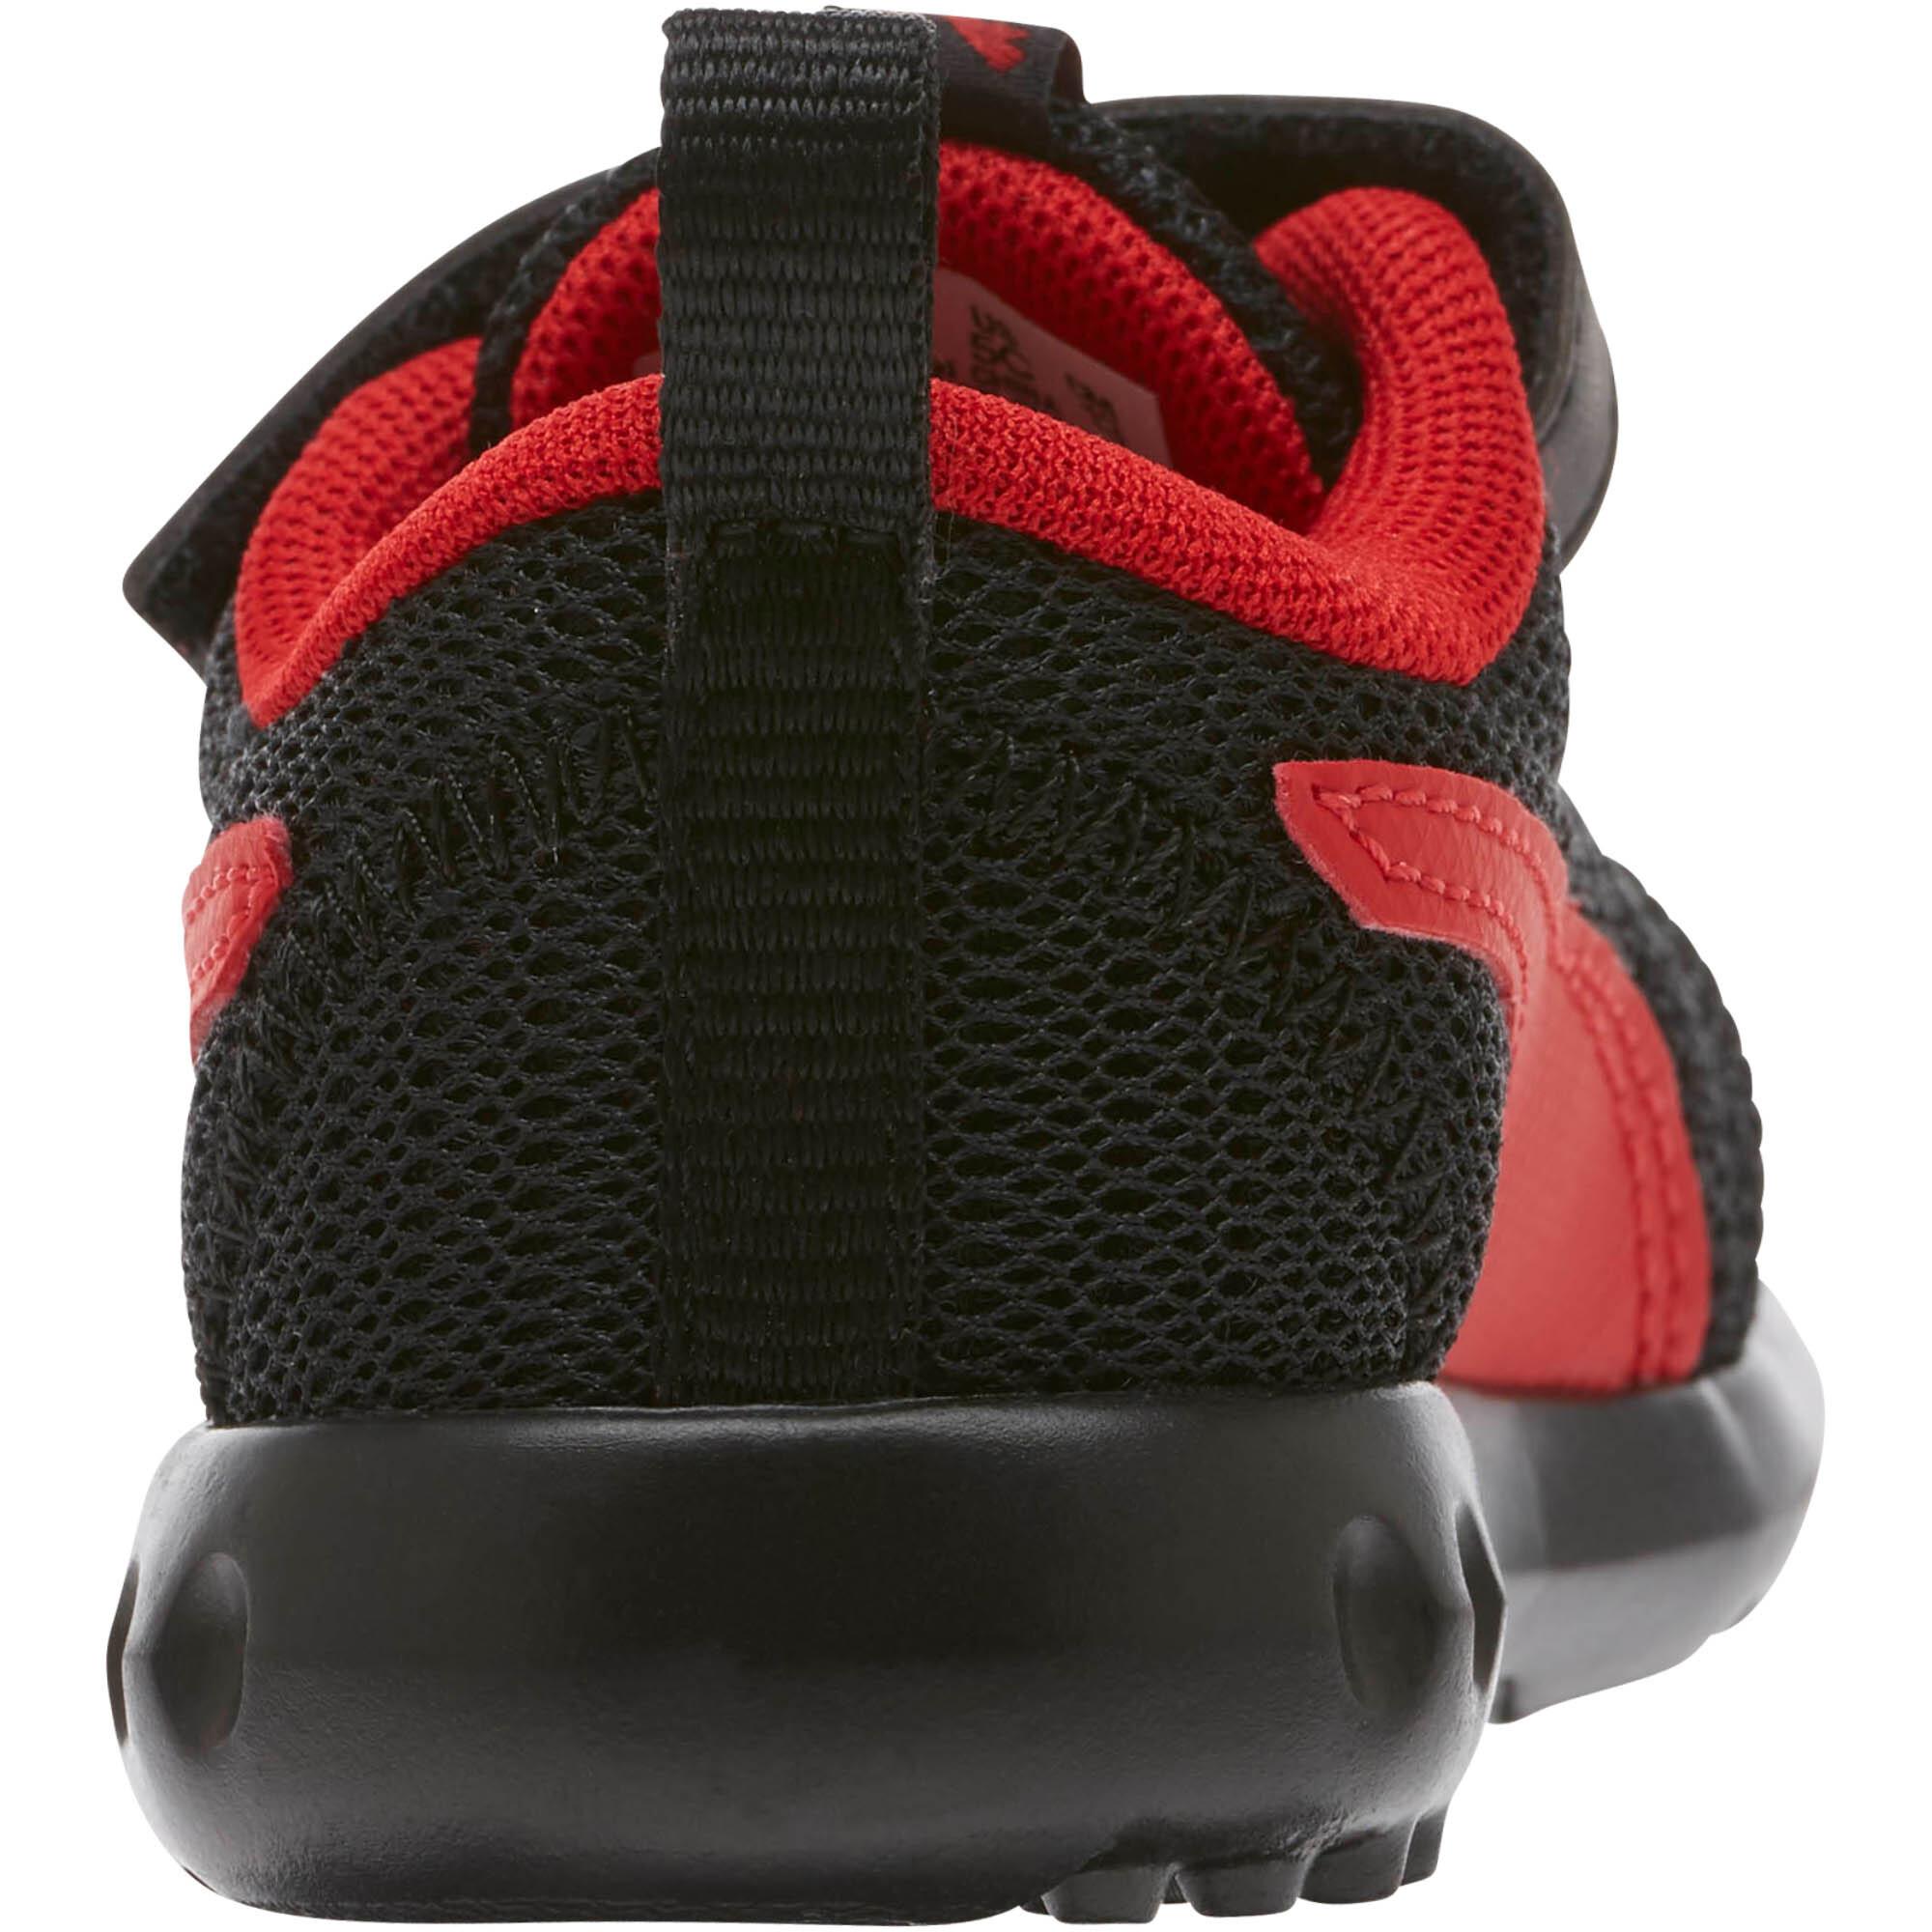 PUMA-Carson-2-Toddler-Shoes-Unisex-Shoe-Kids thumbnail 17